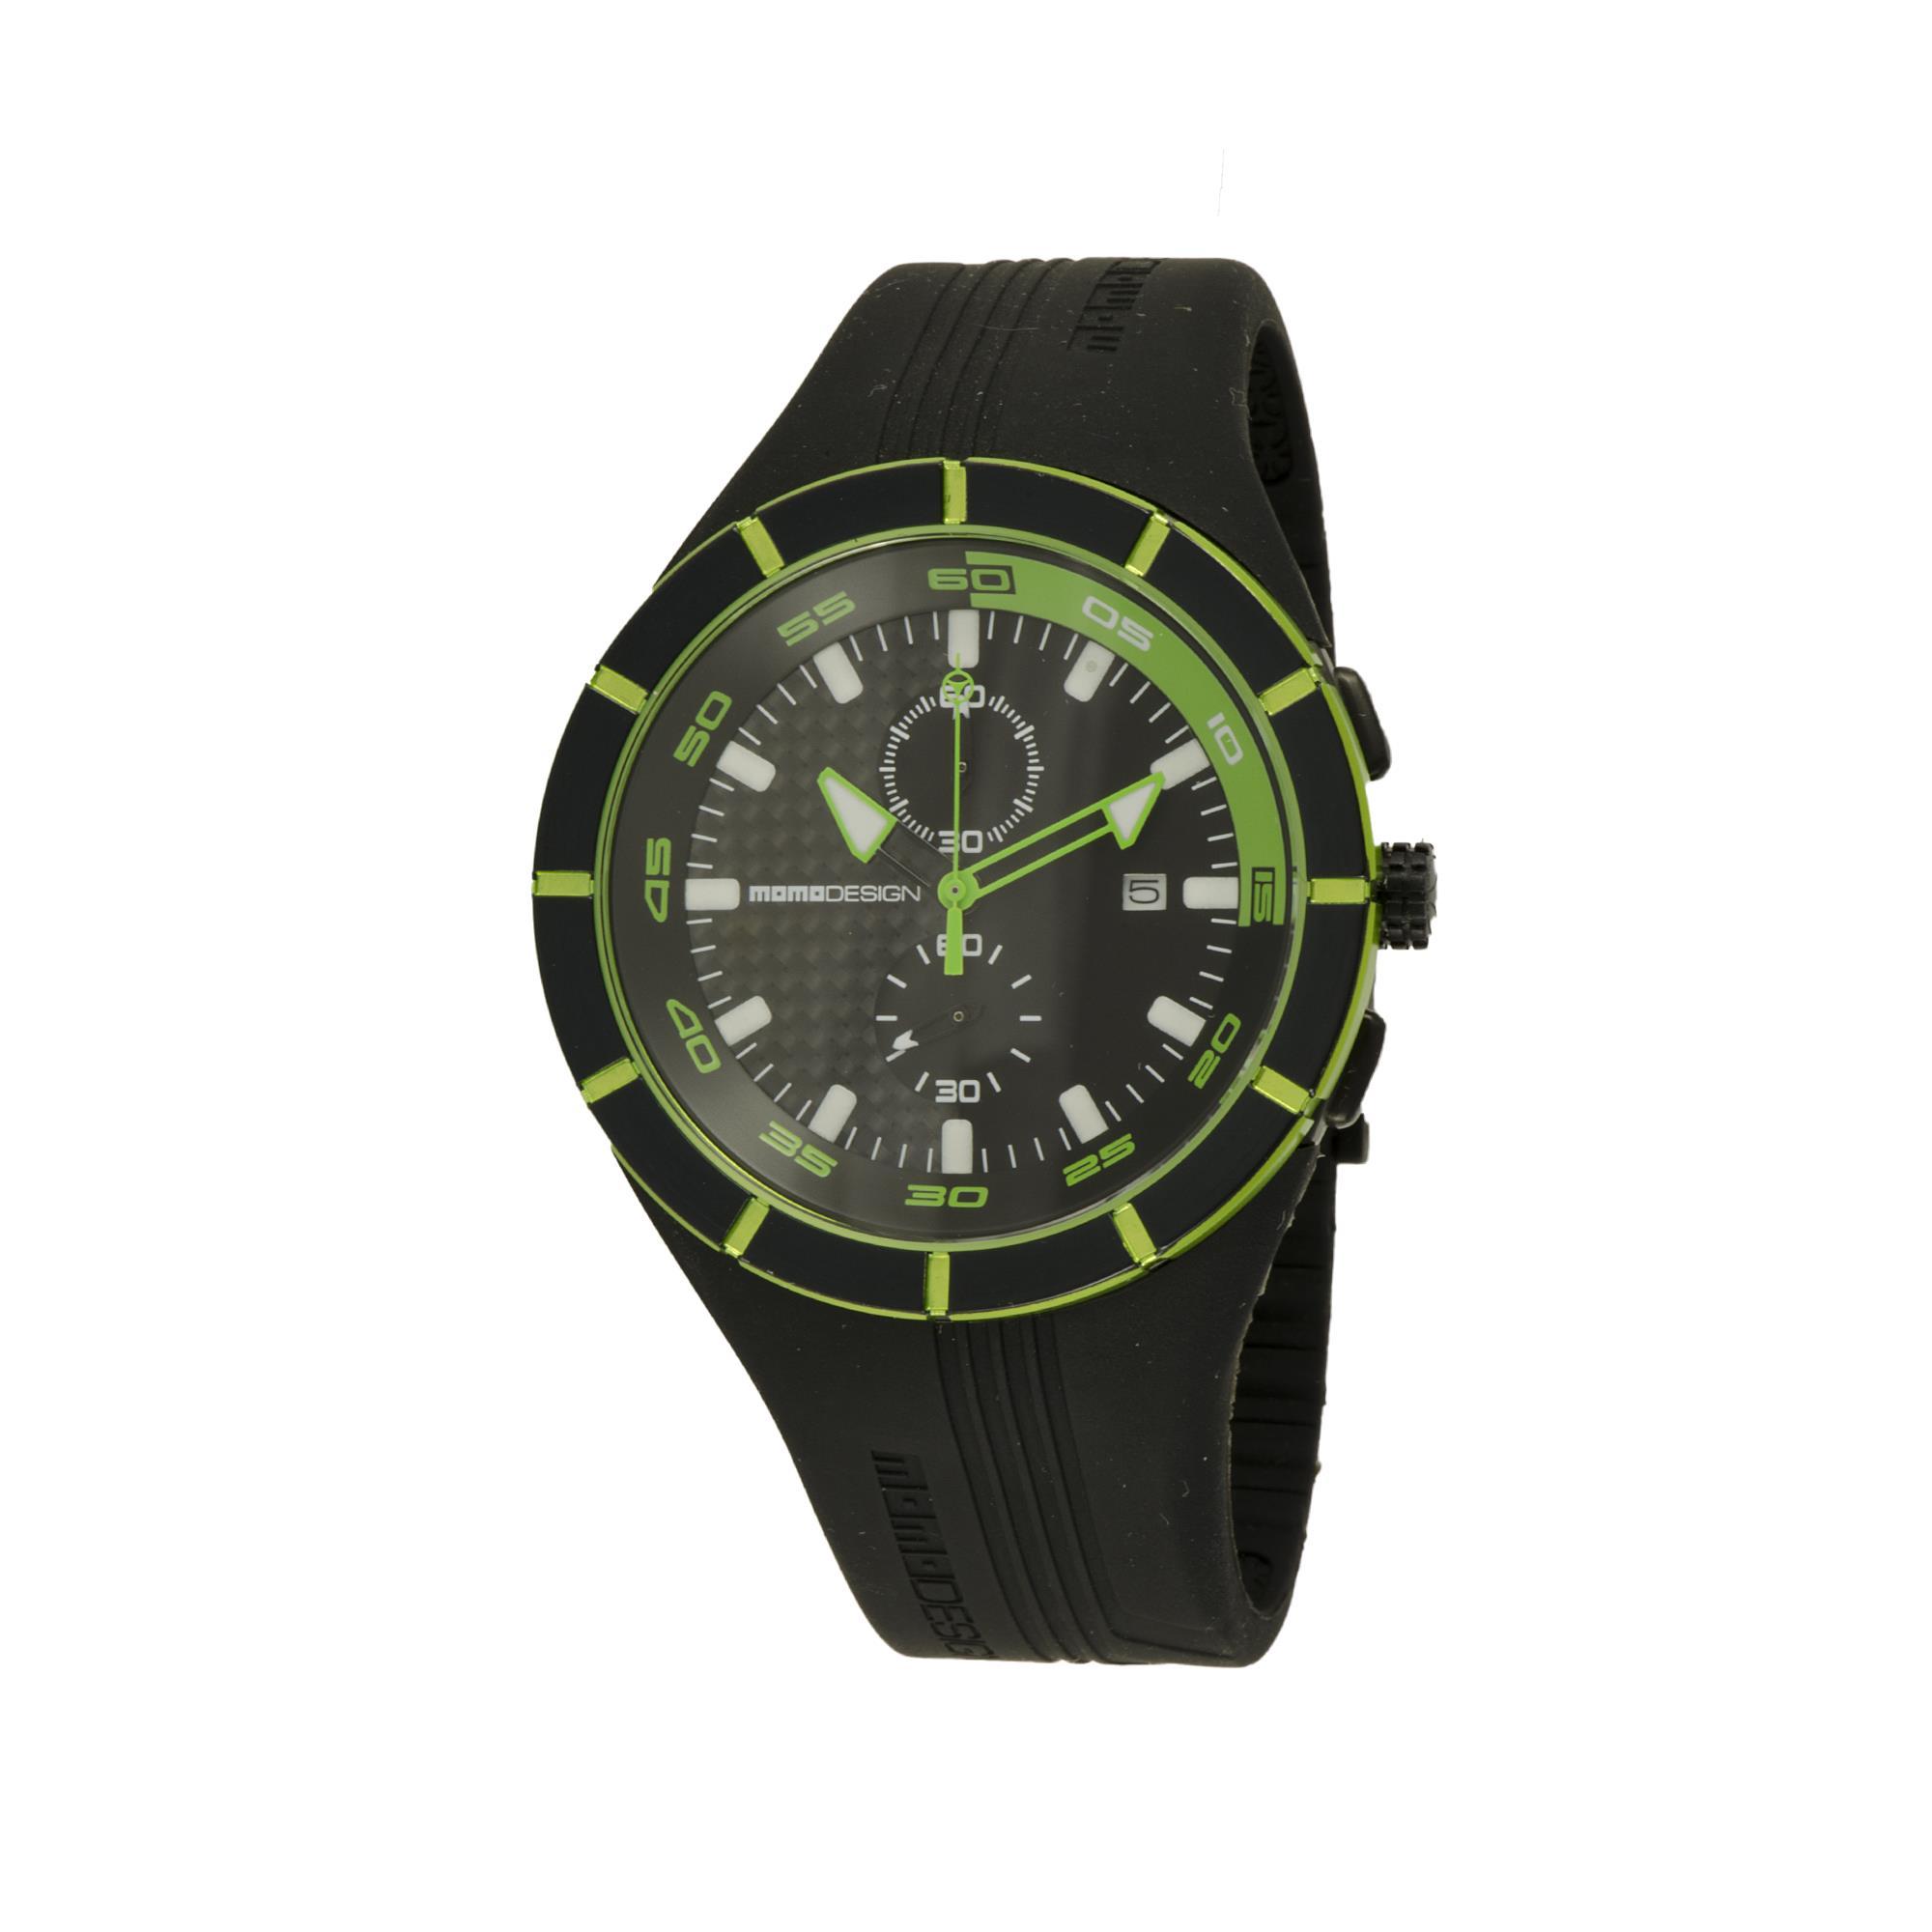 OROLOGIO HIGHWAY BLACK AND GREEN 46 MM - MOMO DESIGN